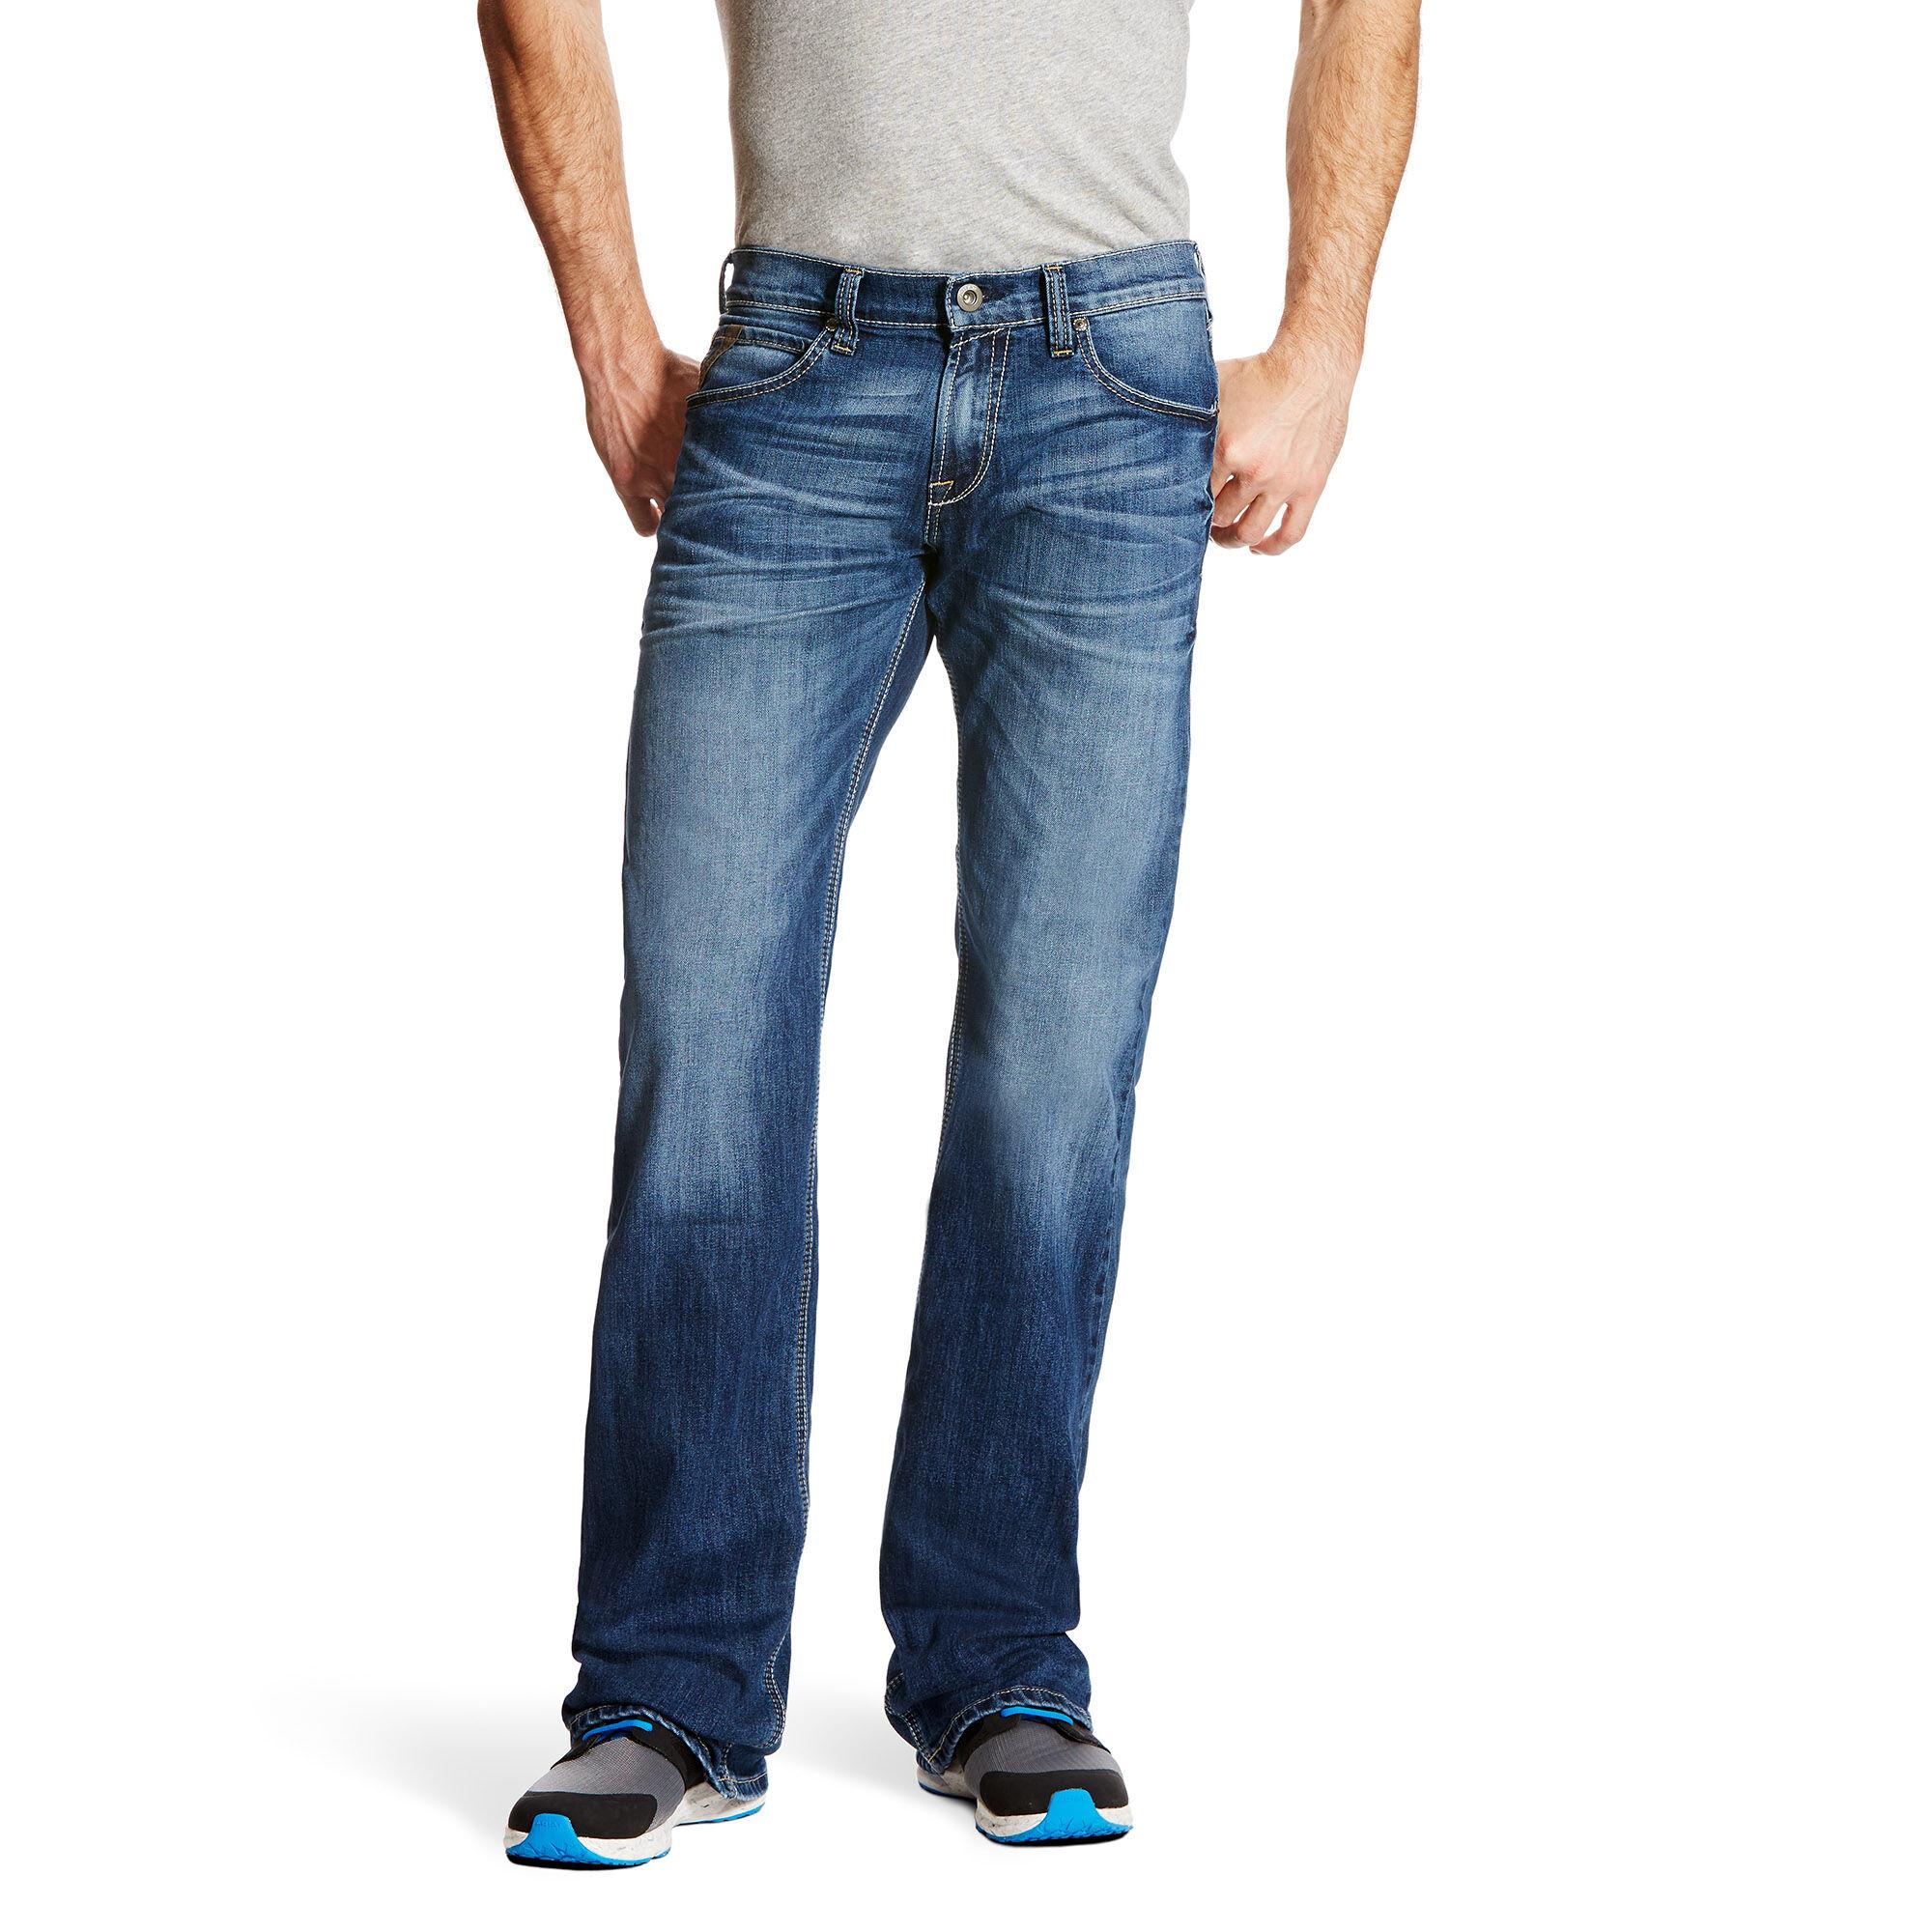 M7 Rocker Destructed Incline Stretch Cooling Boot Cut Jean